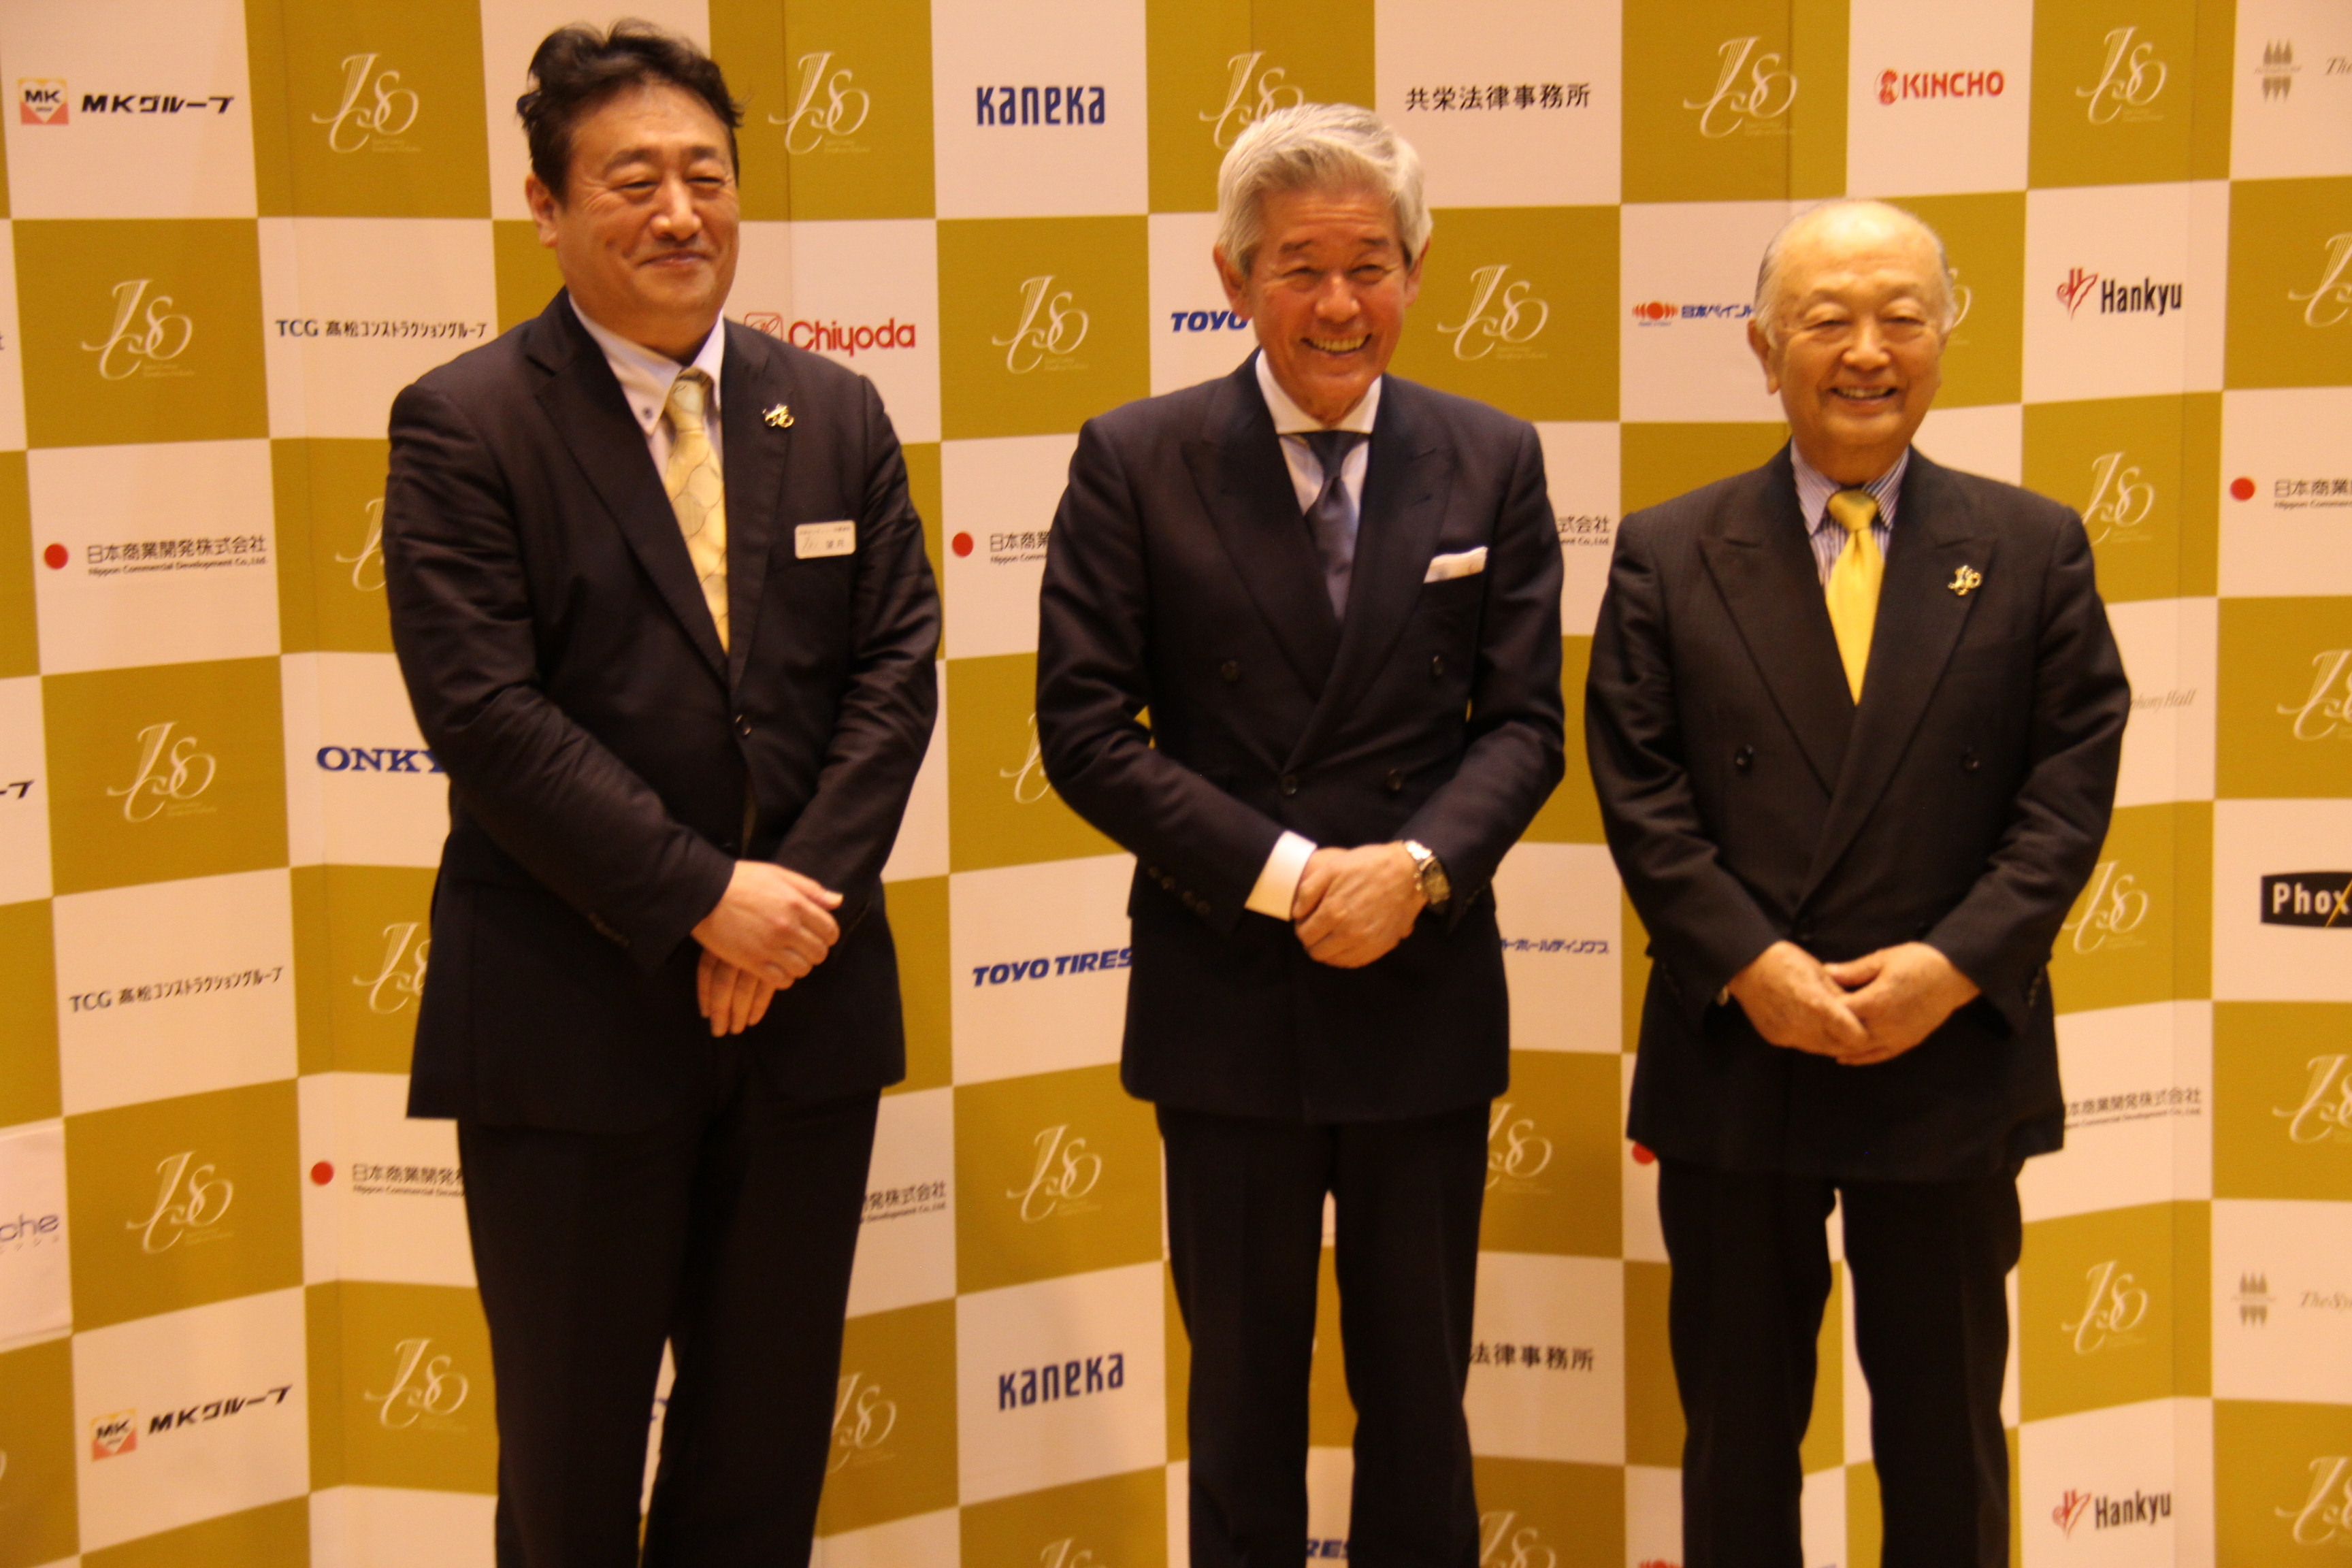 左から望月正樹 楽団長、桜井博志 理事長、水野武夫 前理事長  (C)H.isojima